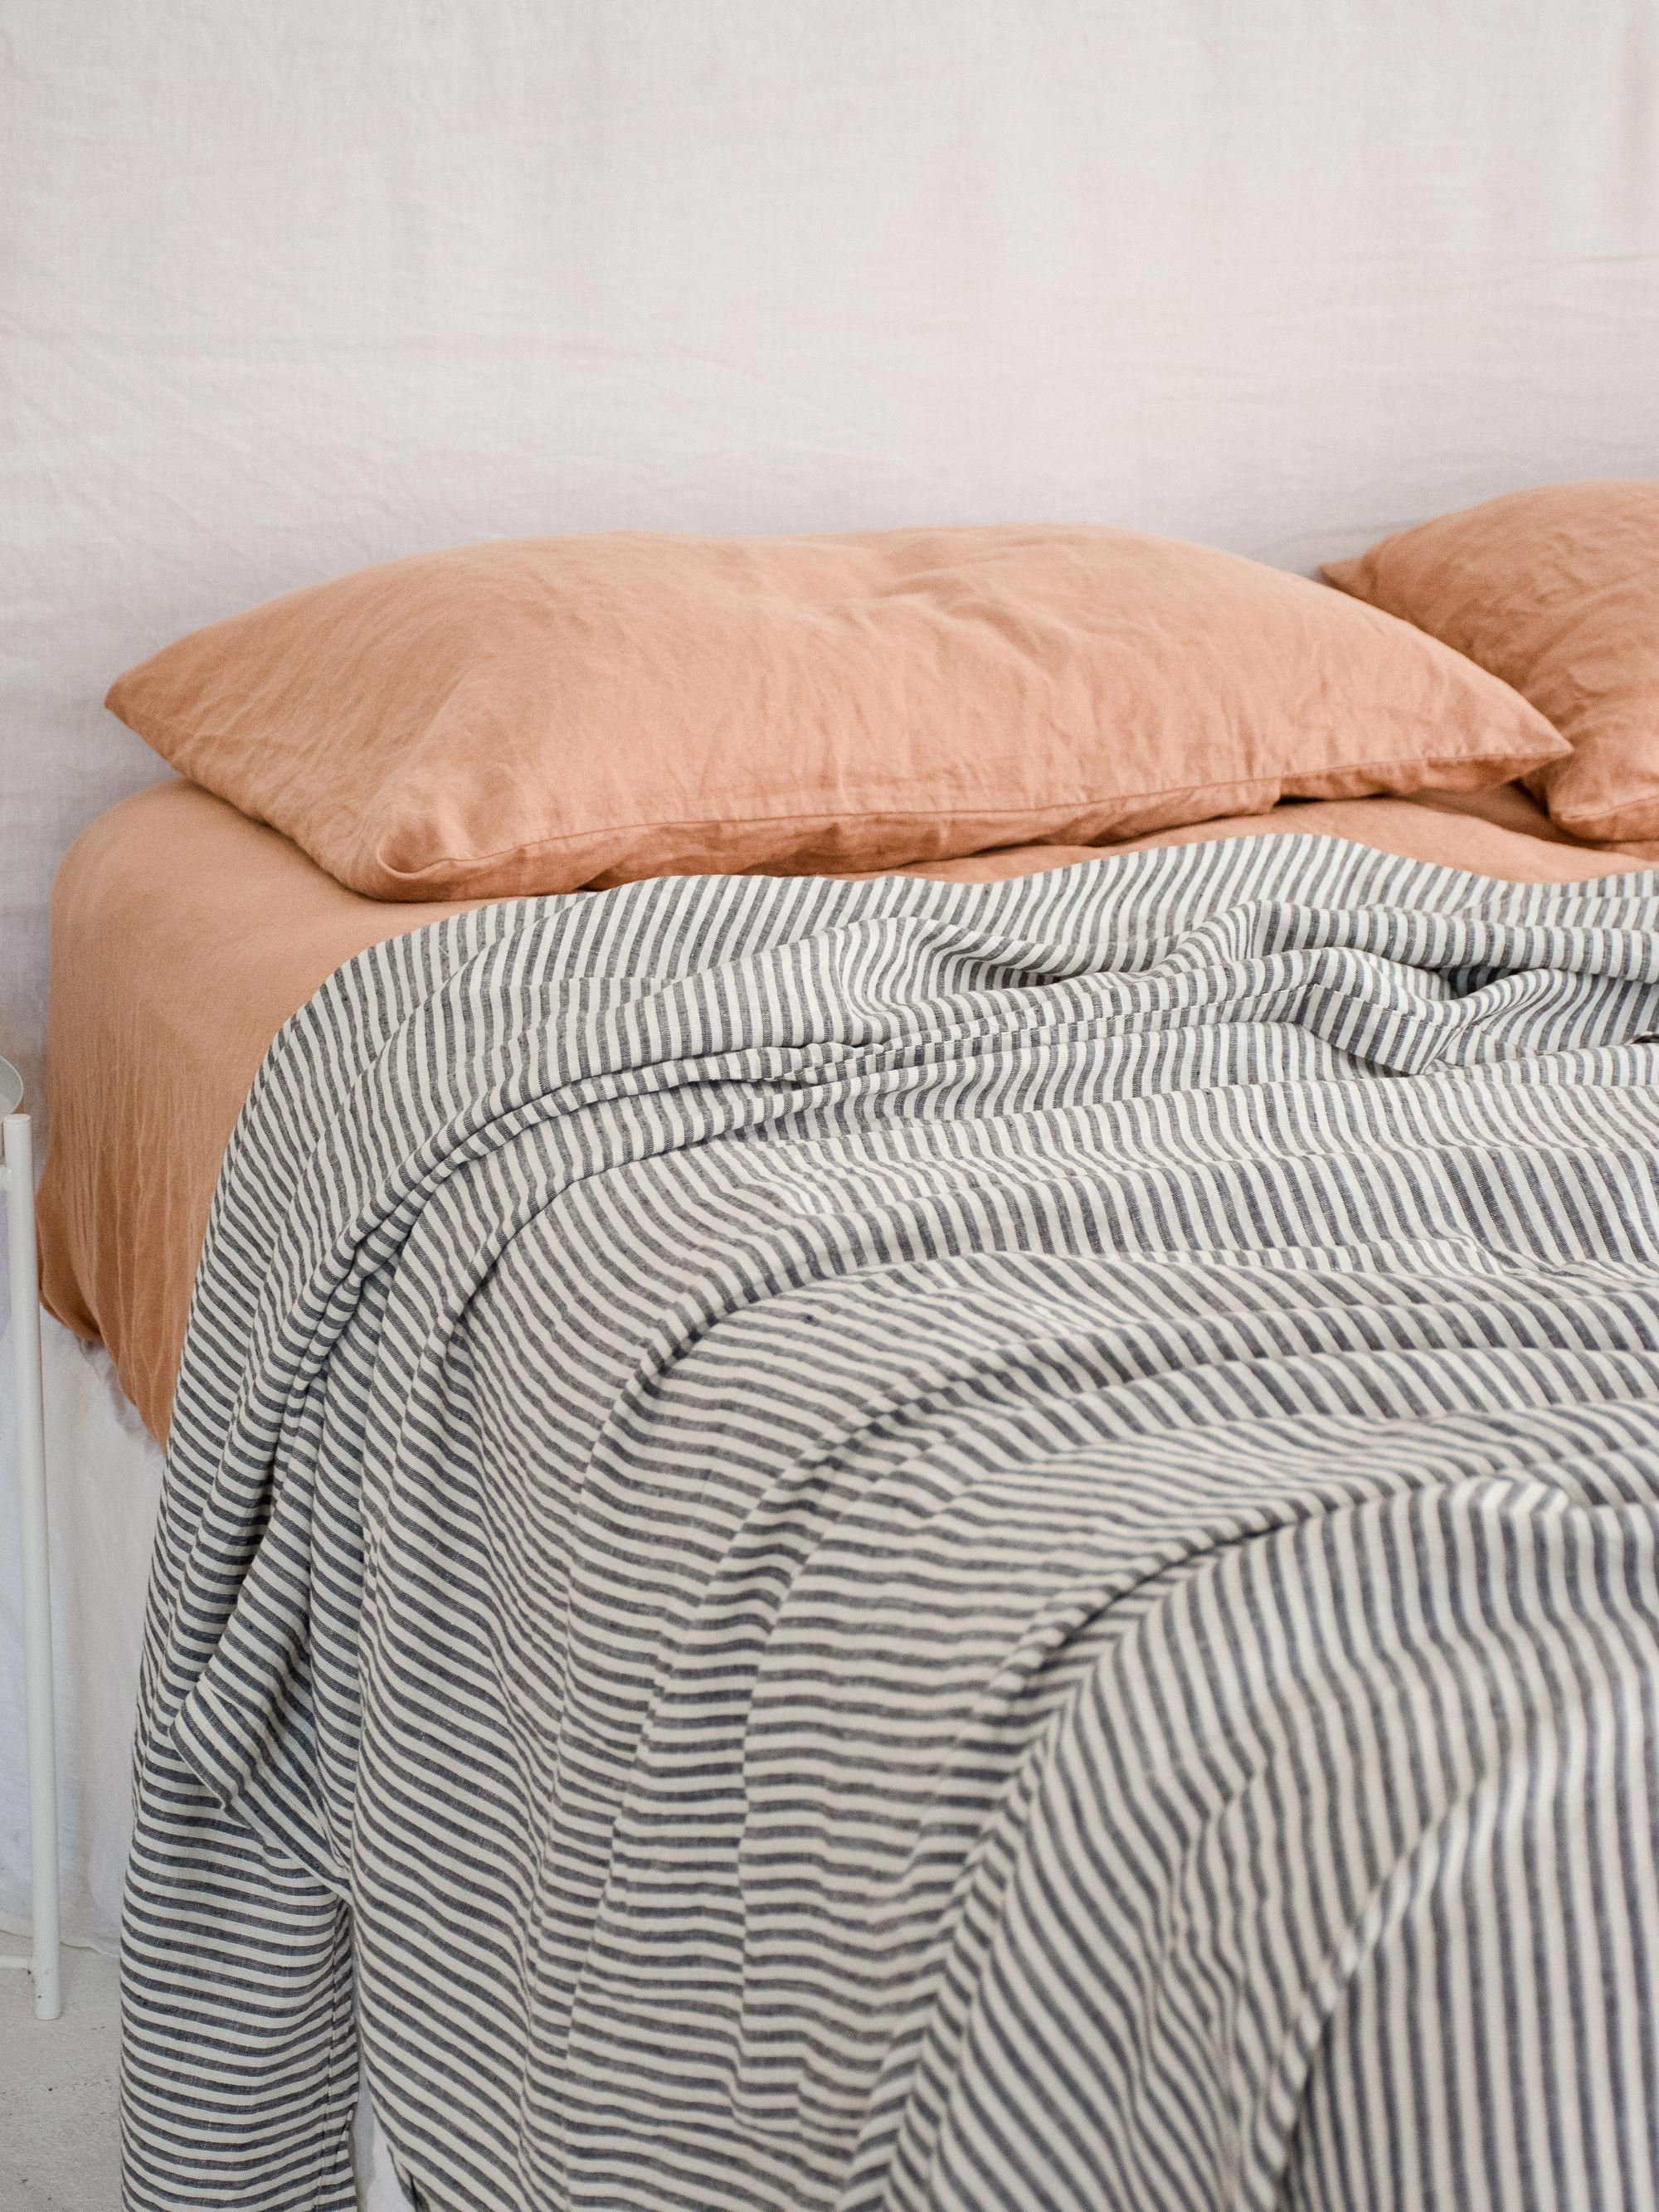 Bed Sheets 60 Cotton 40 Polyester Luxurybeddingfarmhouse Info